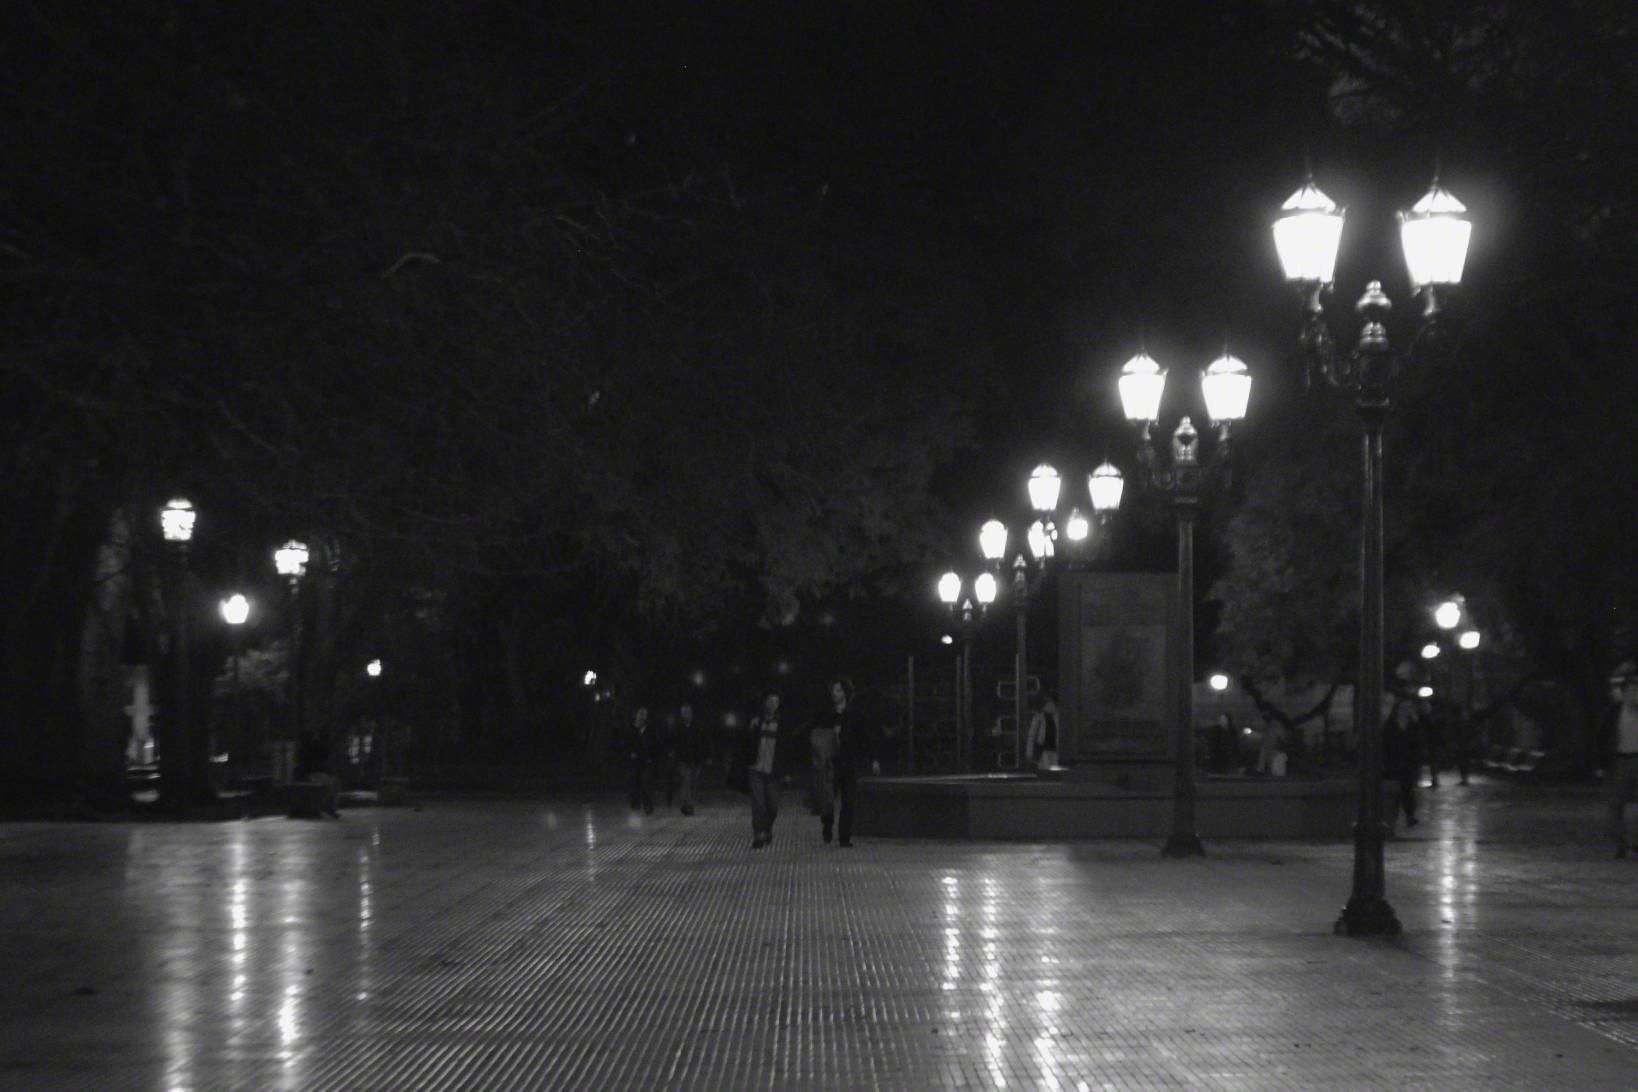 Night+time+in+Plaza+San+Martin.jpg